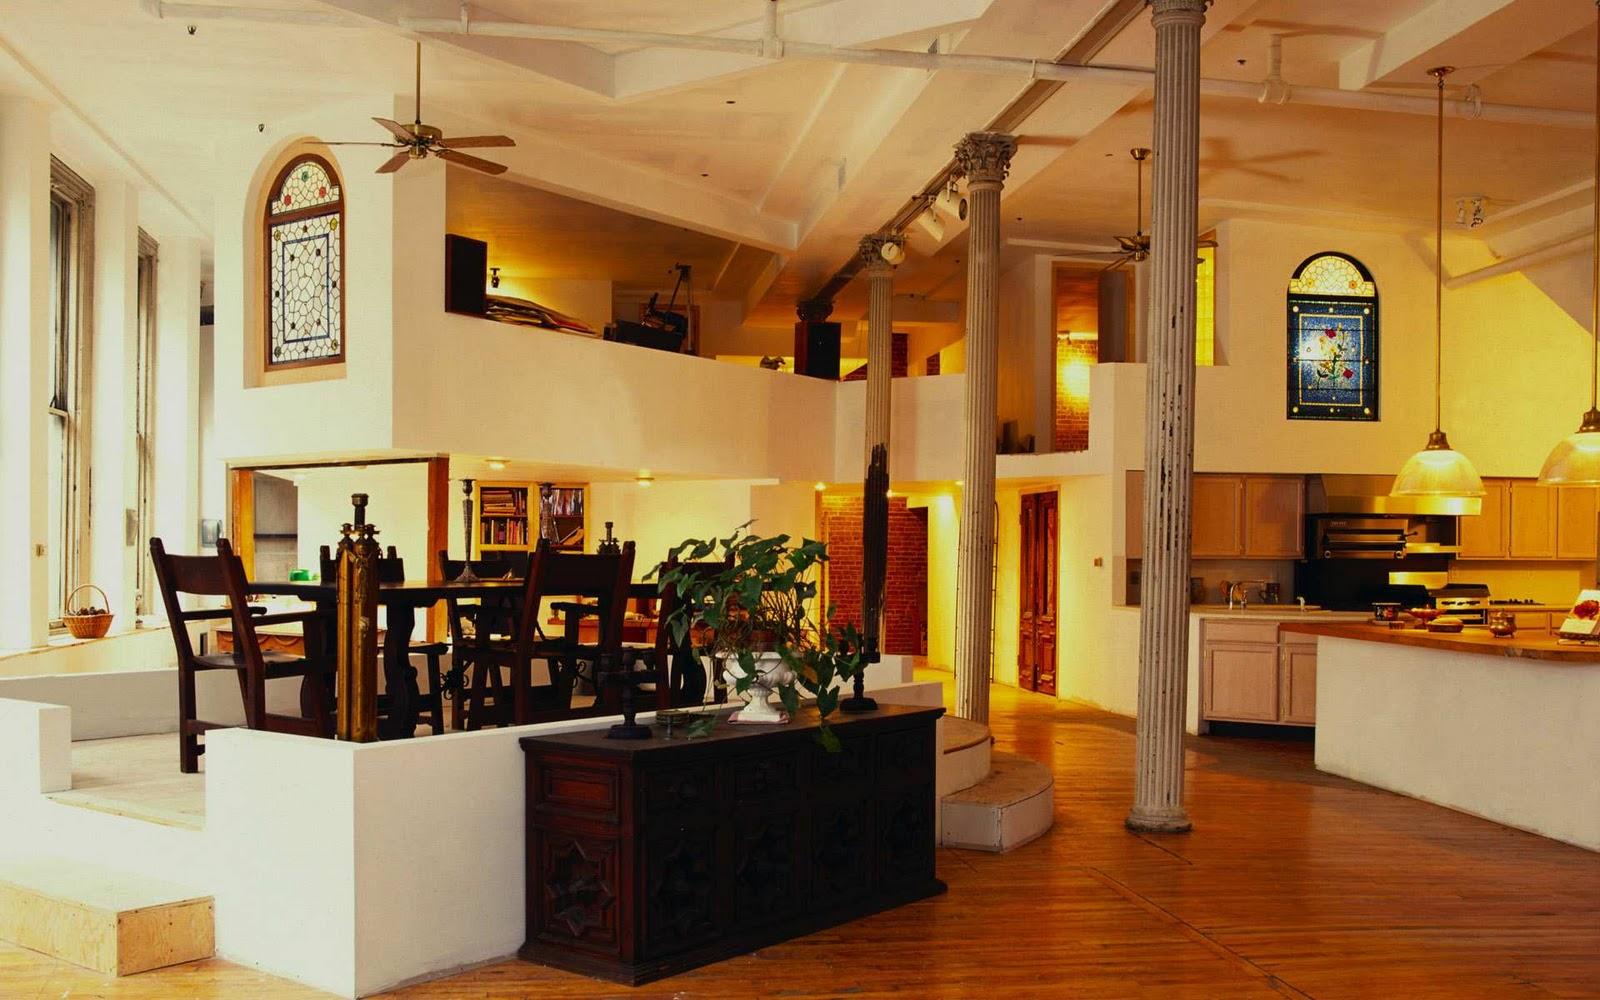 western home decorating dining r00m with modern interior design. Black Bedroom Furniture Sets. Home Design Ideas